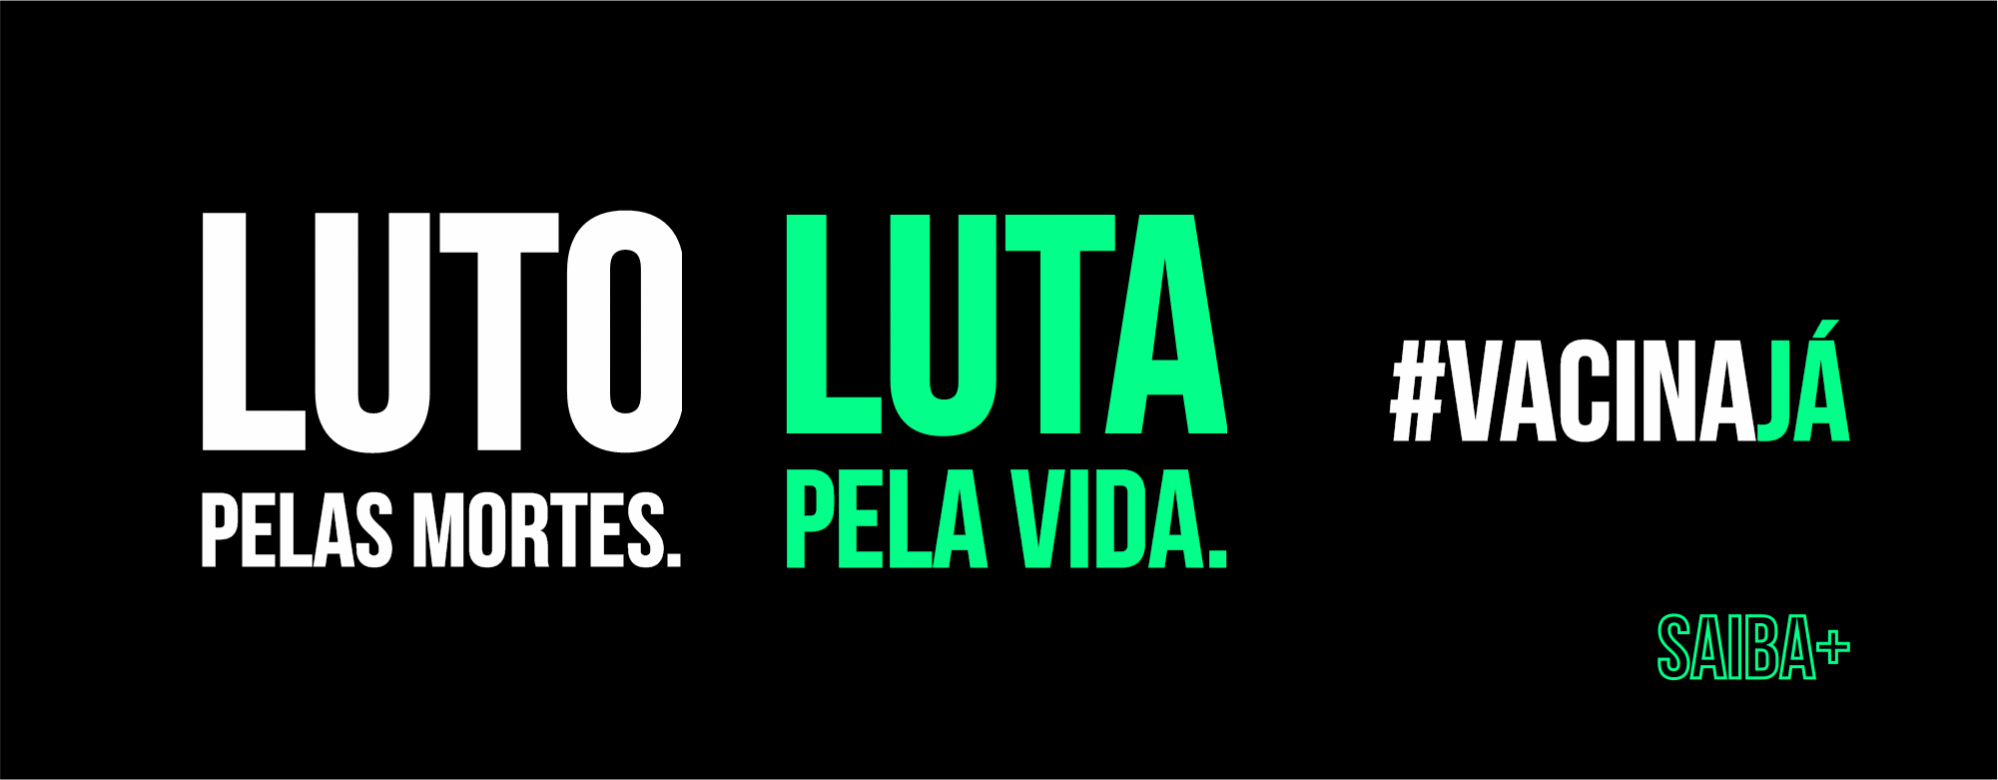 Luto pelas mortes. Luta pela Vida. #VacinaJá